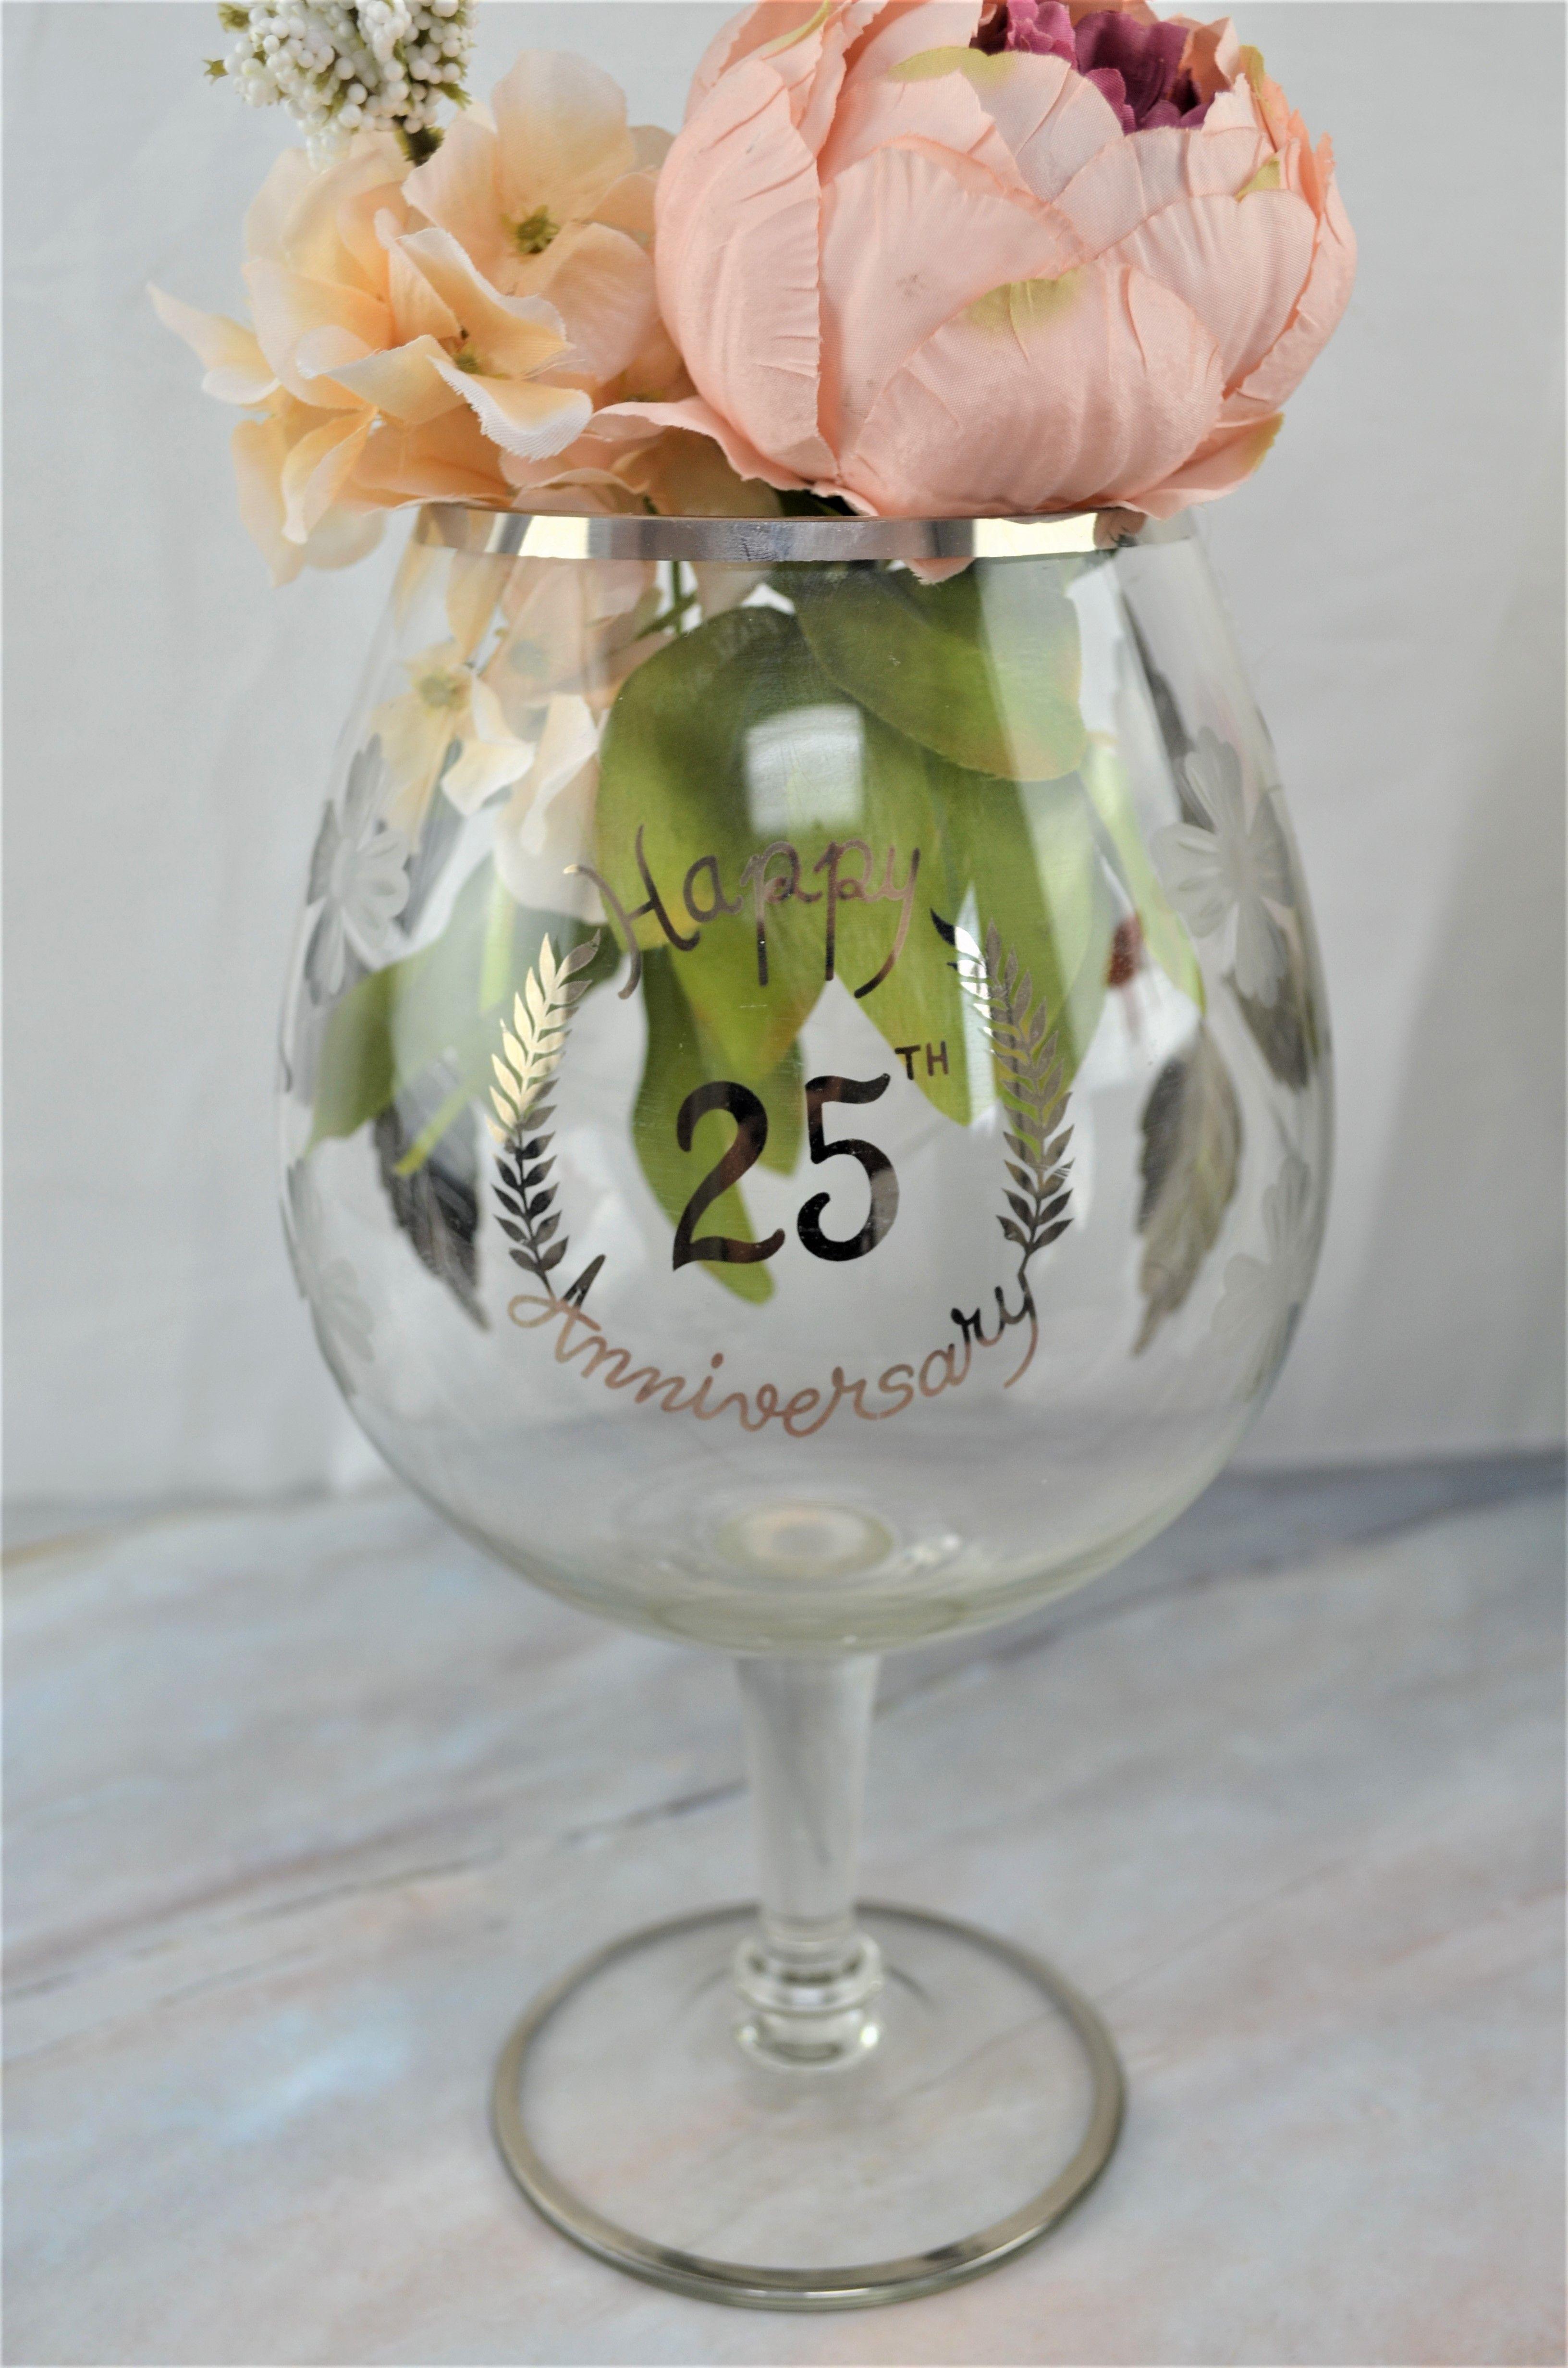 25th anniversarygift gift Ideas wedding husband wife